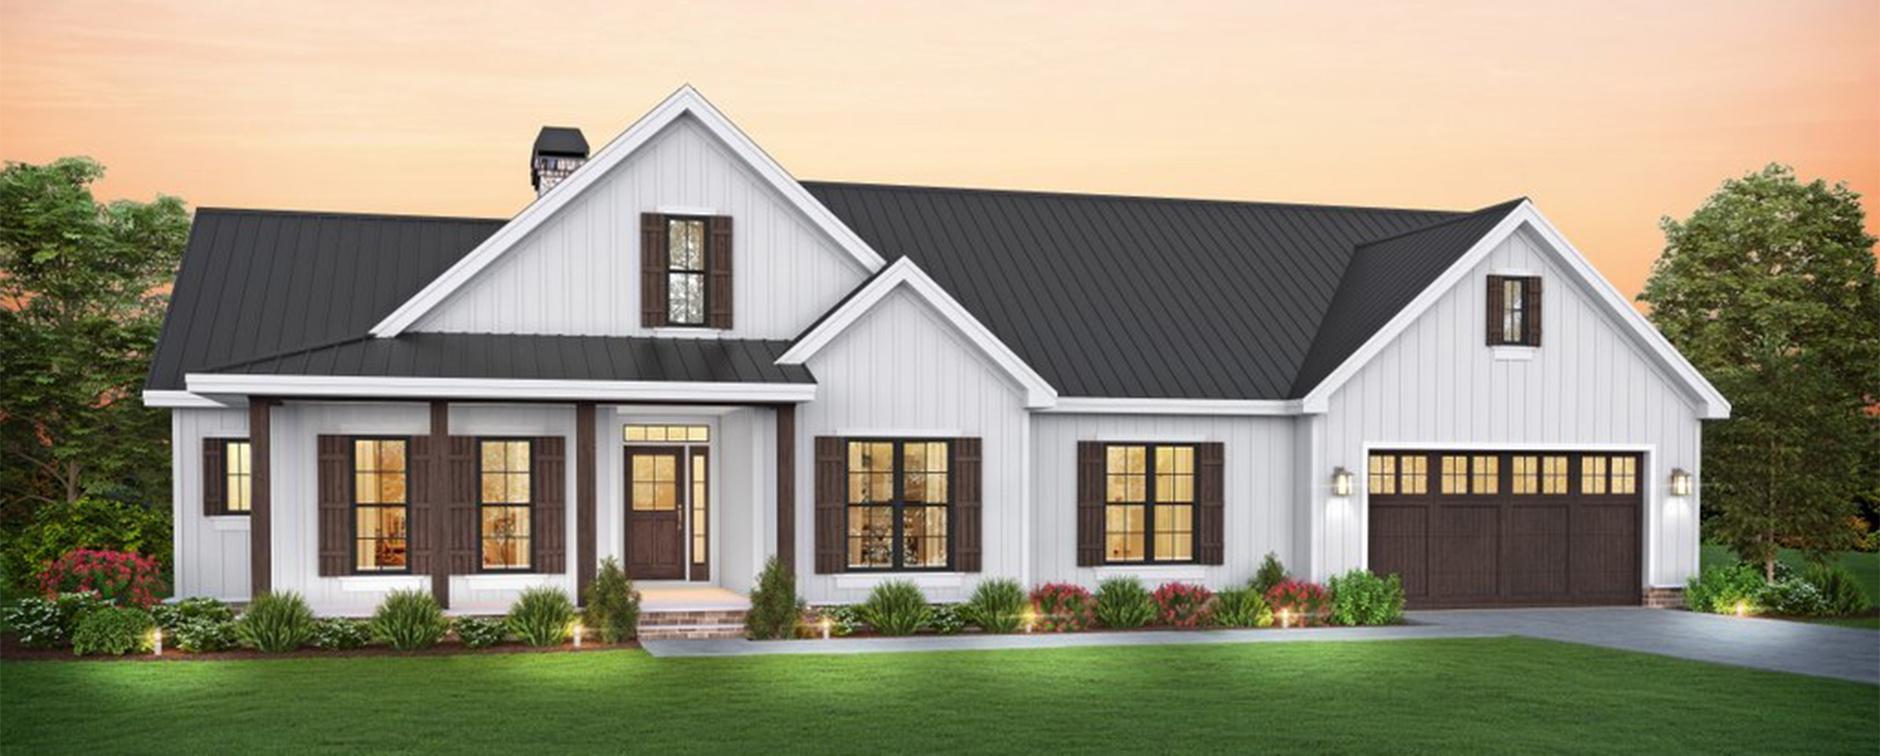 Trending: 1 Story Farmhouse Plans